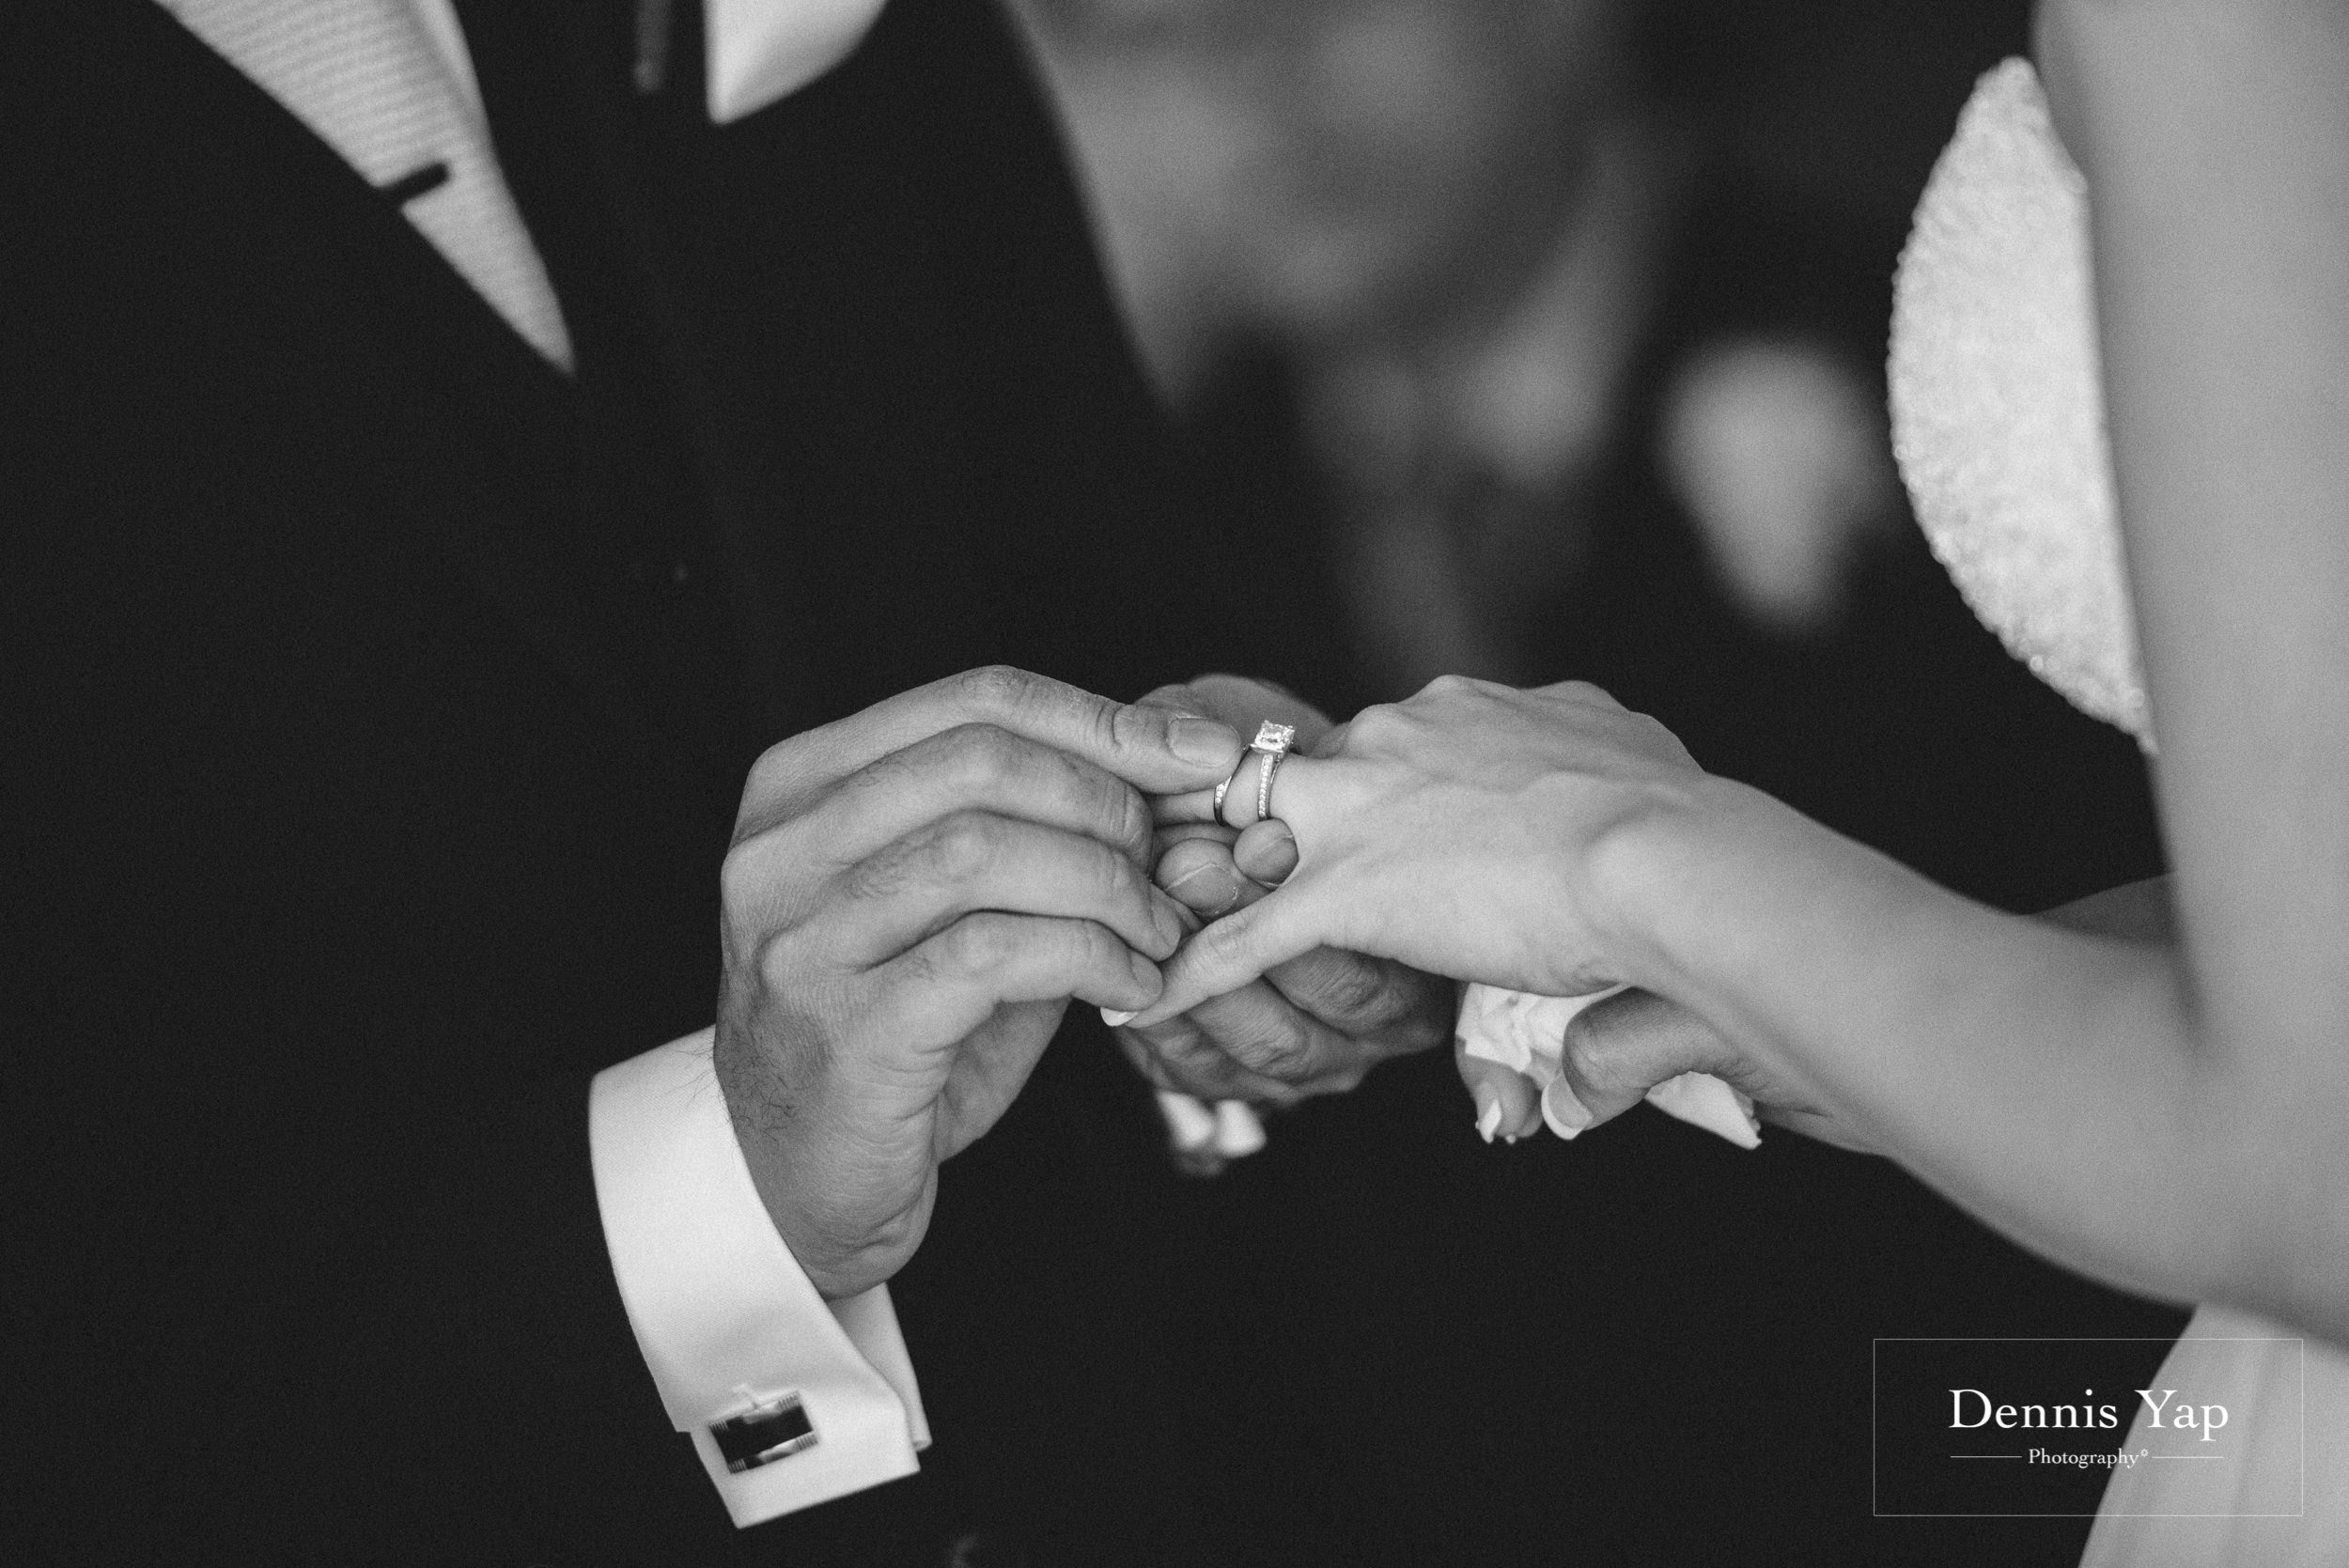 thang veng vietnamese wedding brisbane dennis yap photography malaysia wedding photographer-26.jpg